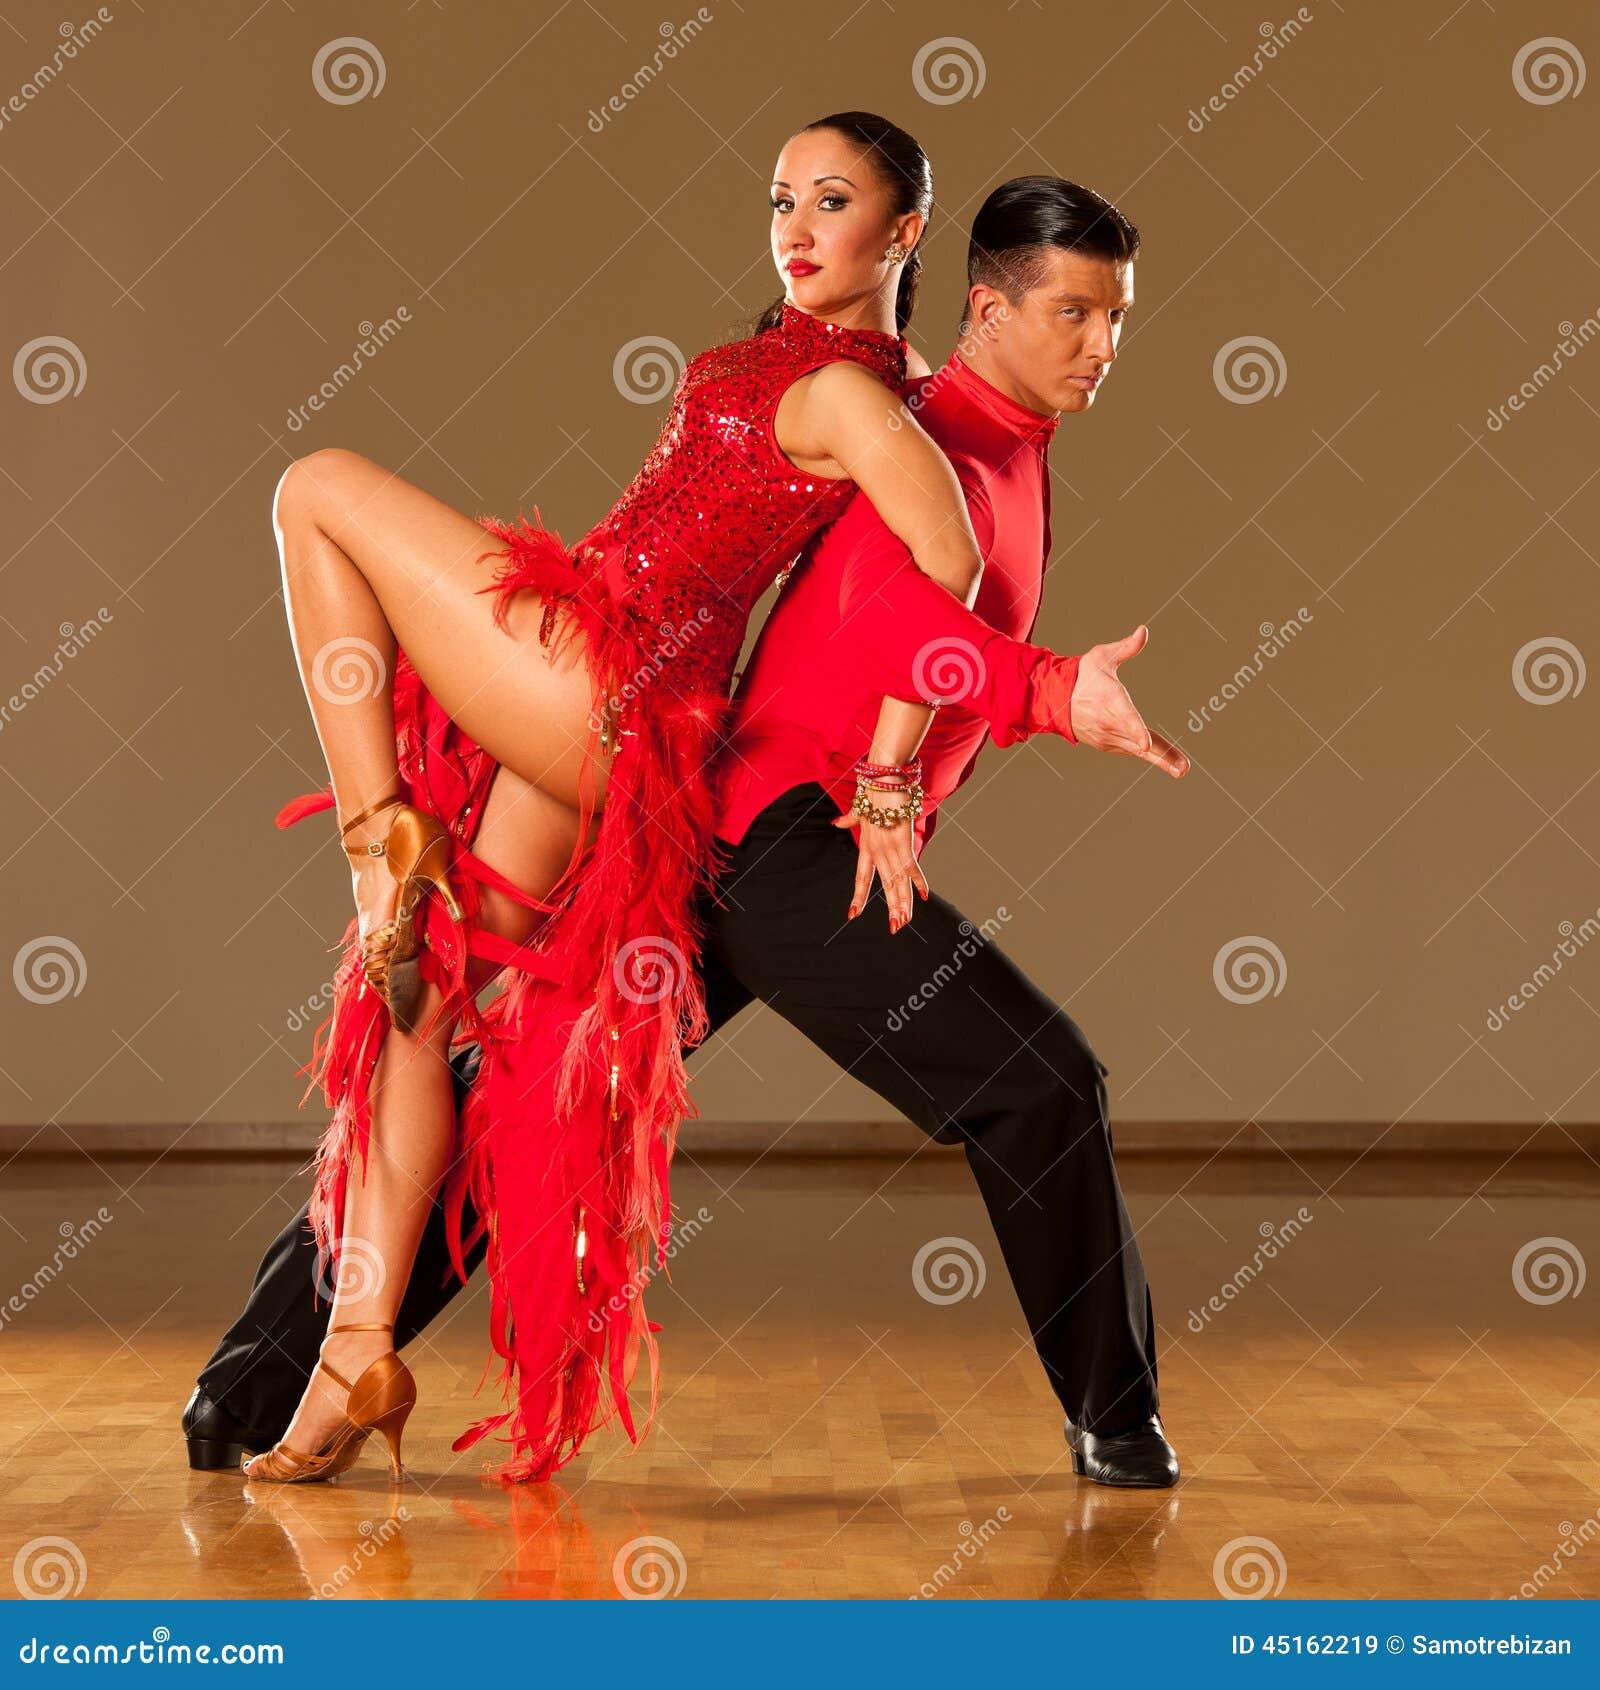 Latino Dance Couple In Action - Dancing Wild Samba Stock Photo - Image ...